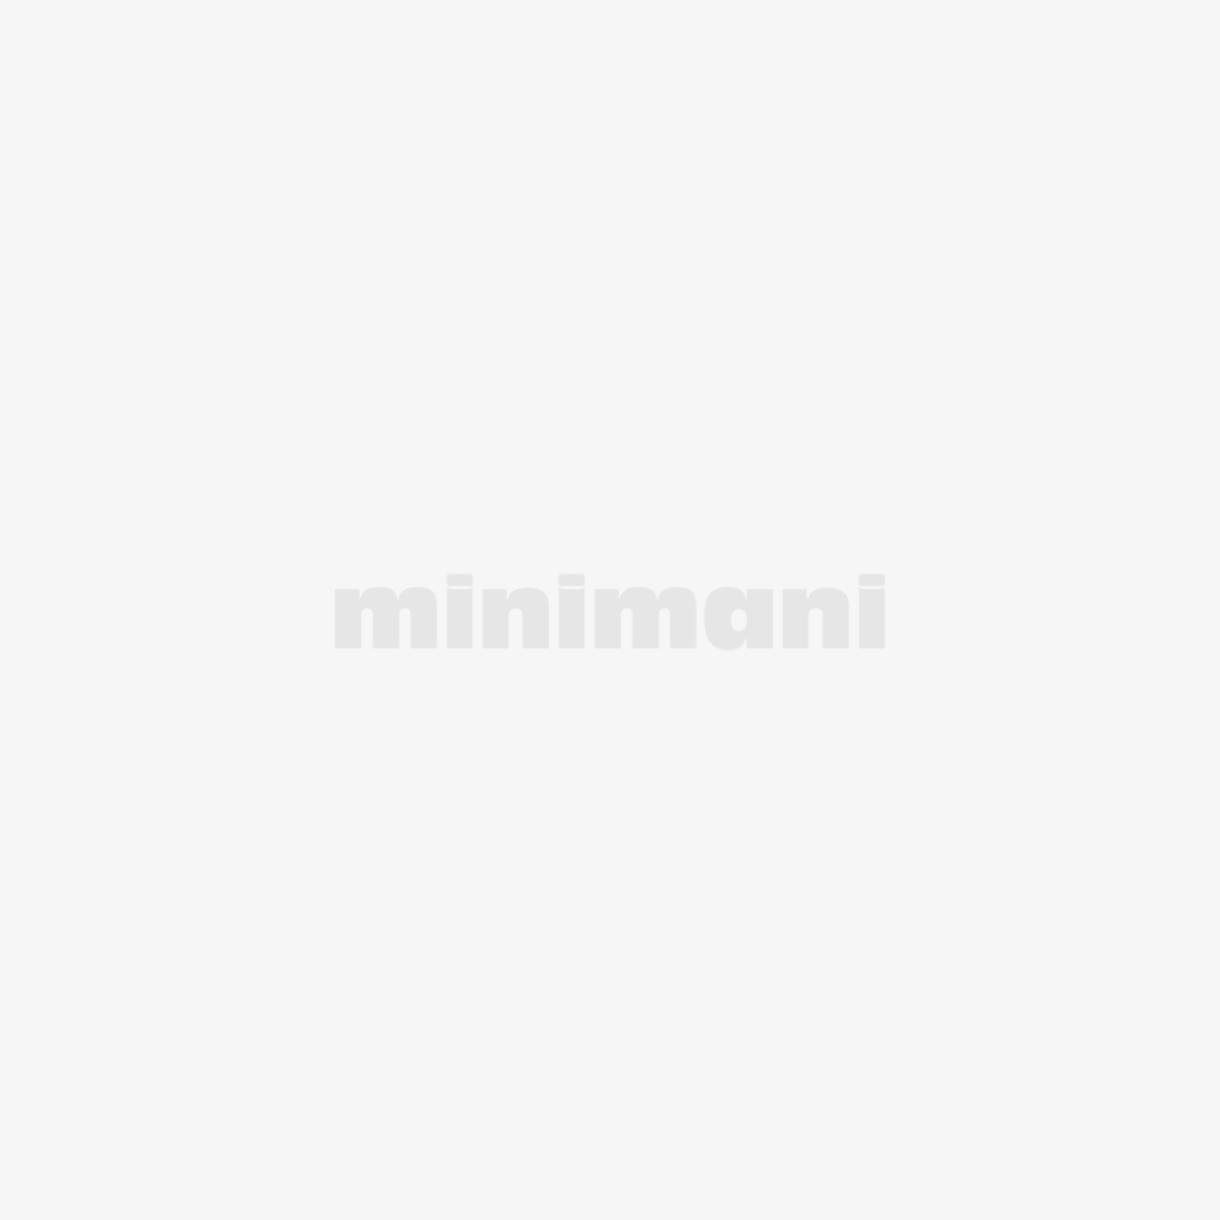 Hanseline laakerivaseliini 50ml